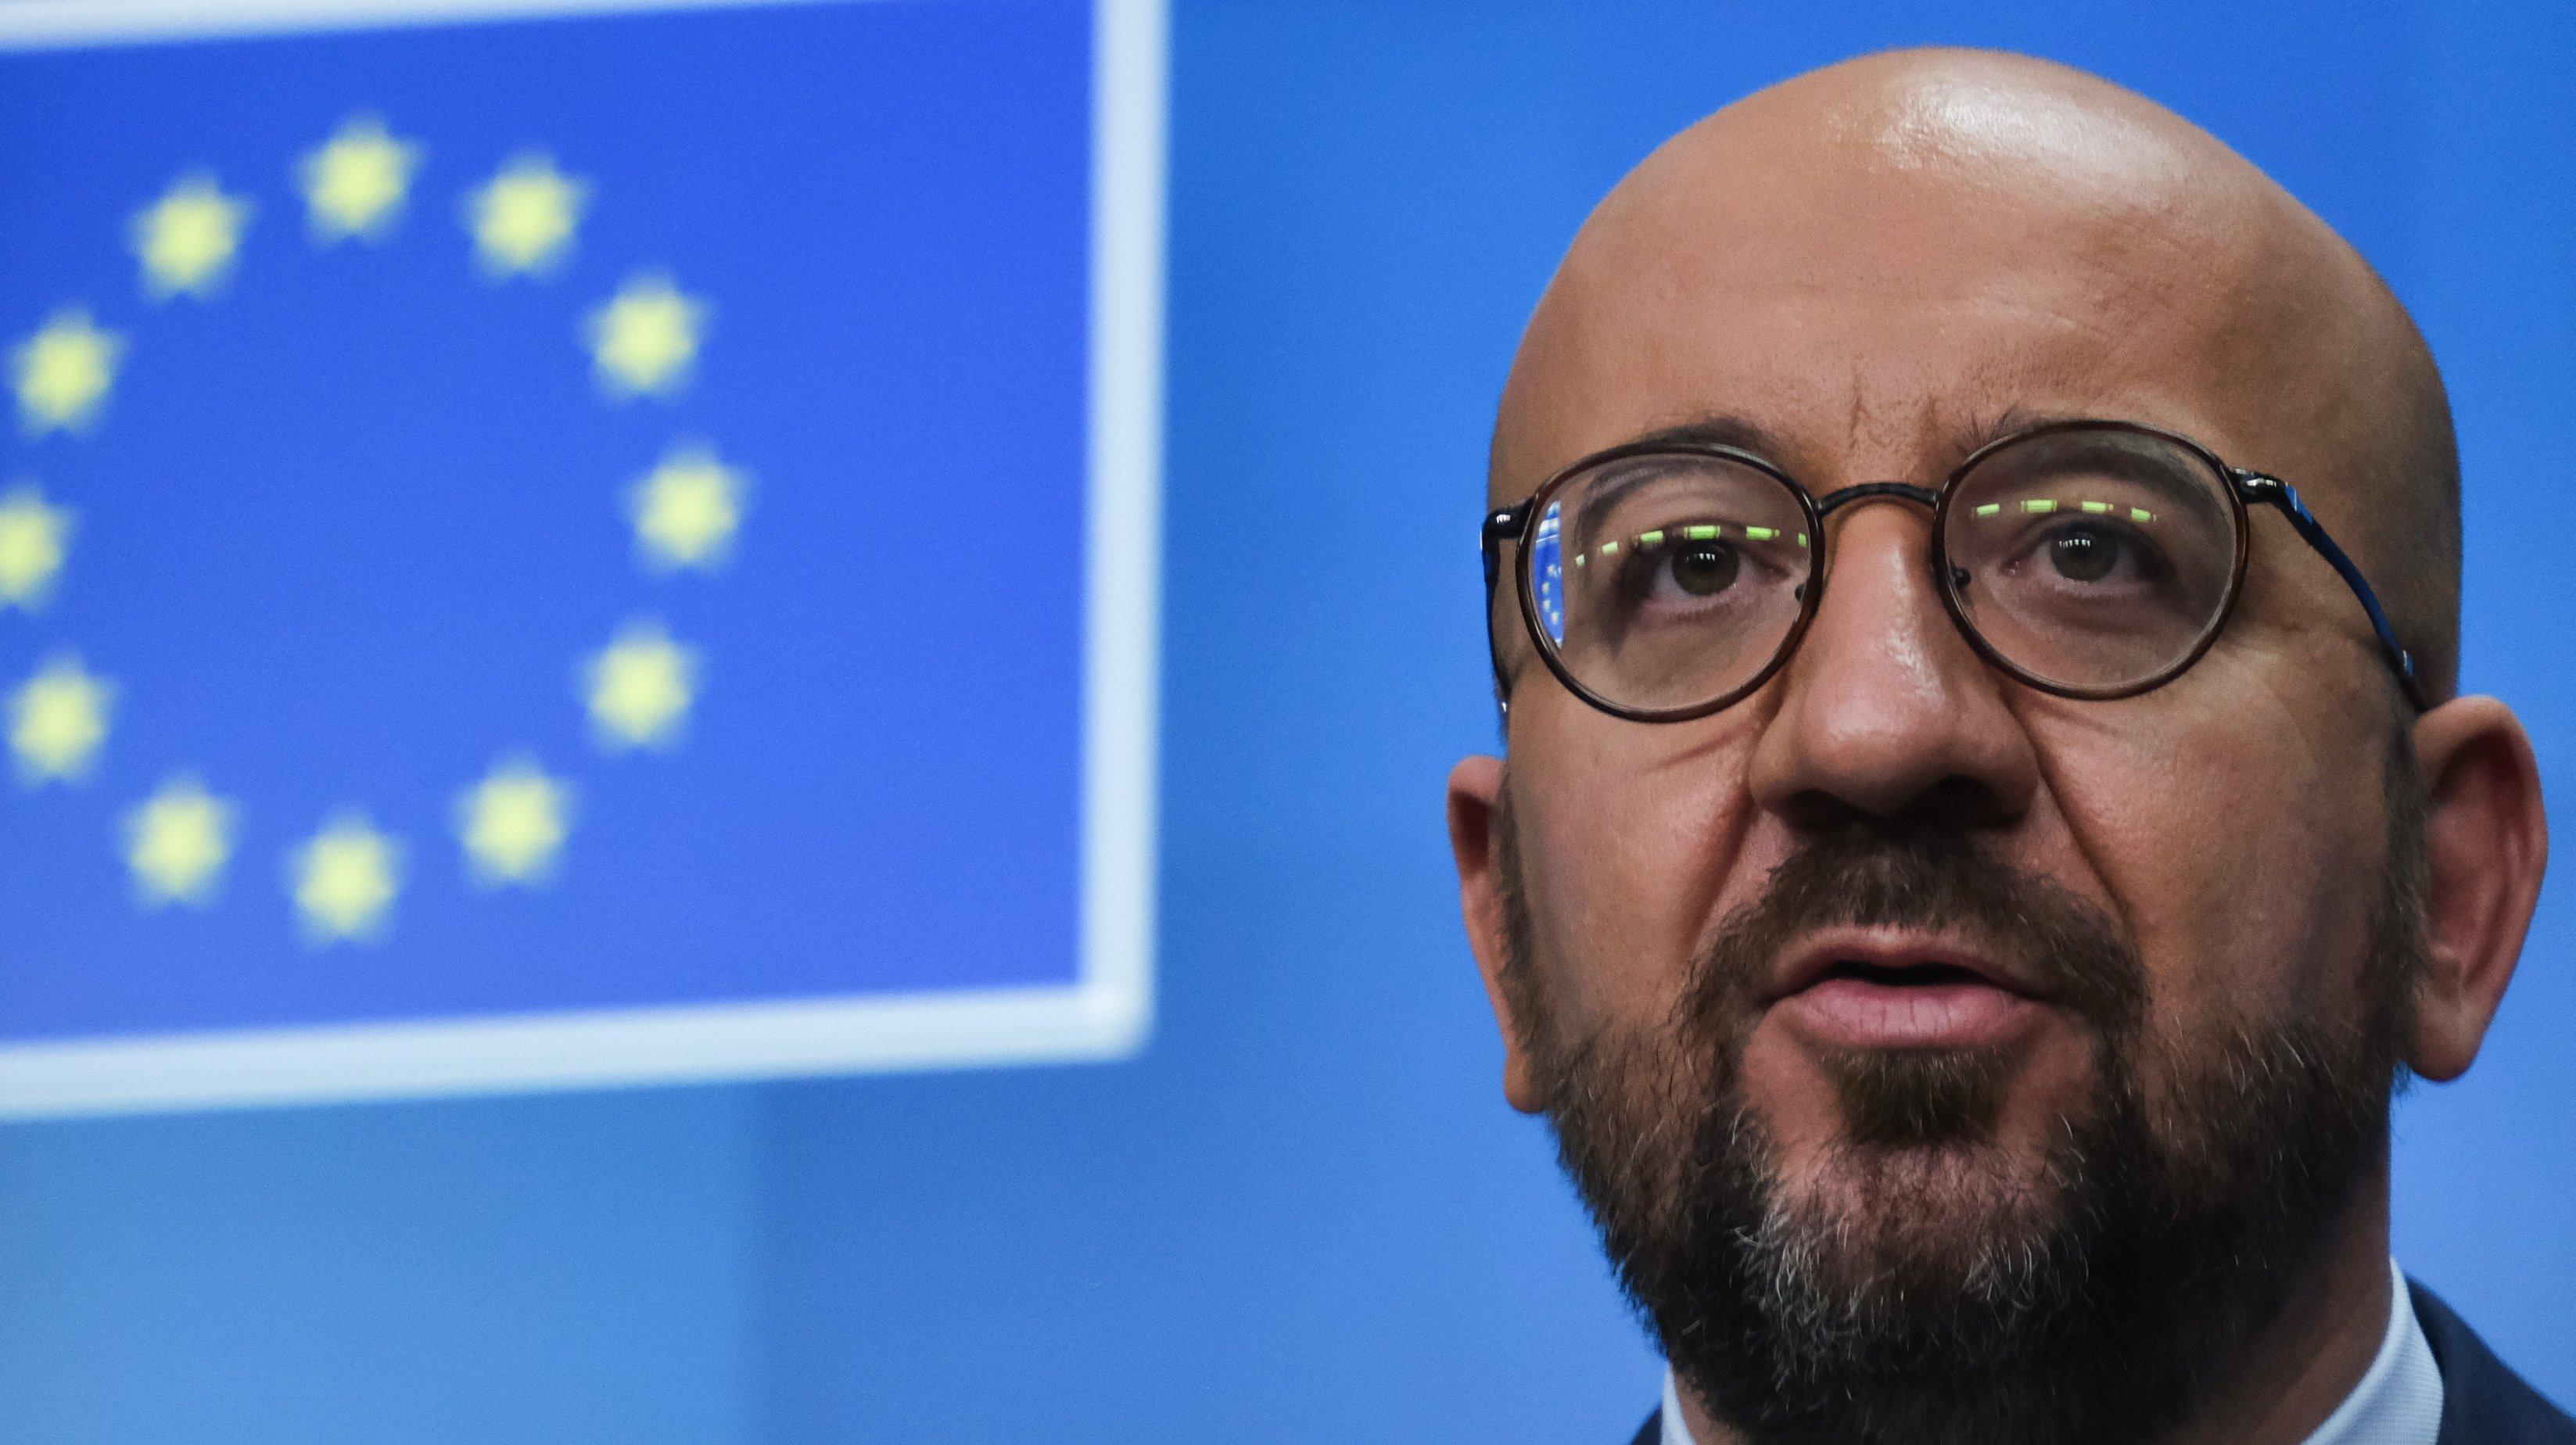 European Commission PresidentUrsula von der Leyen News Conference Following EU Leaders Meeting